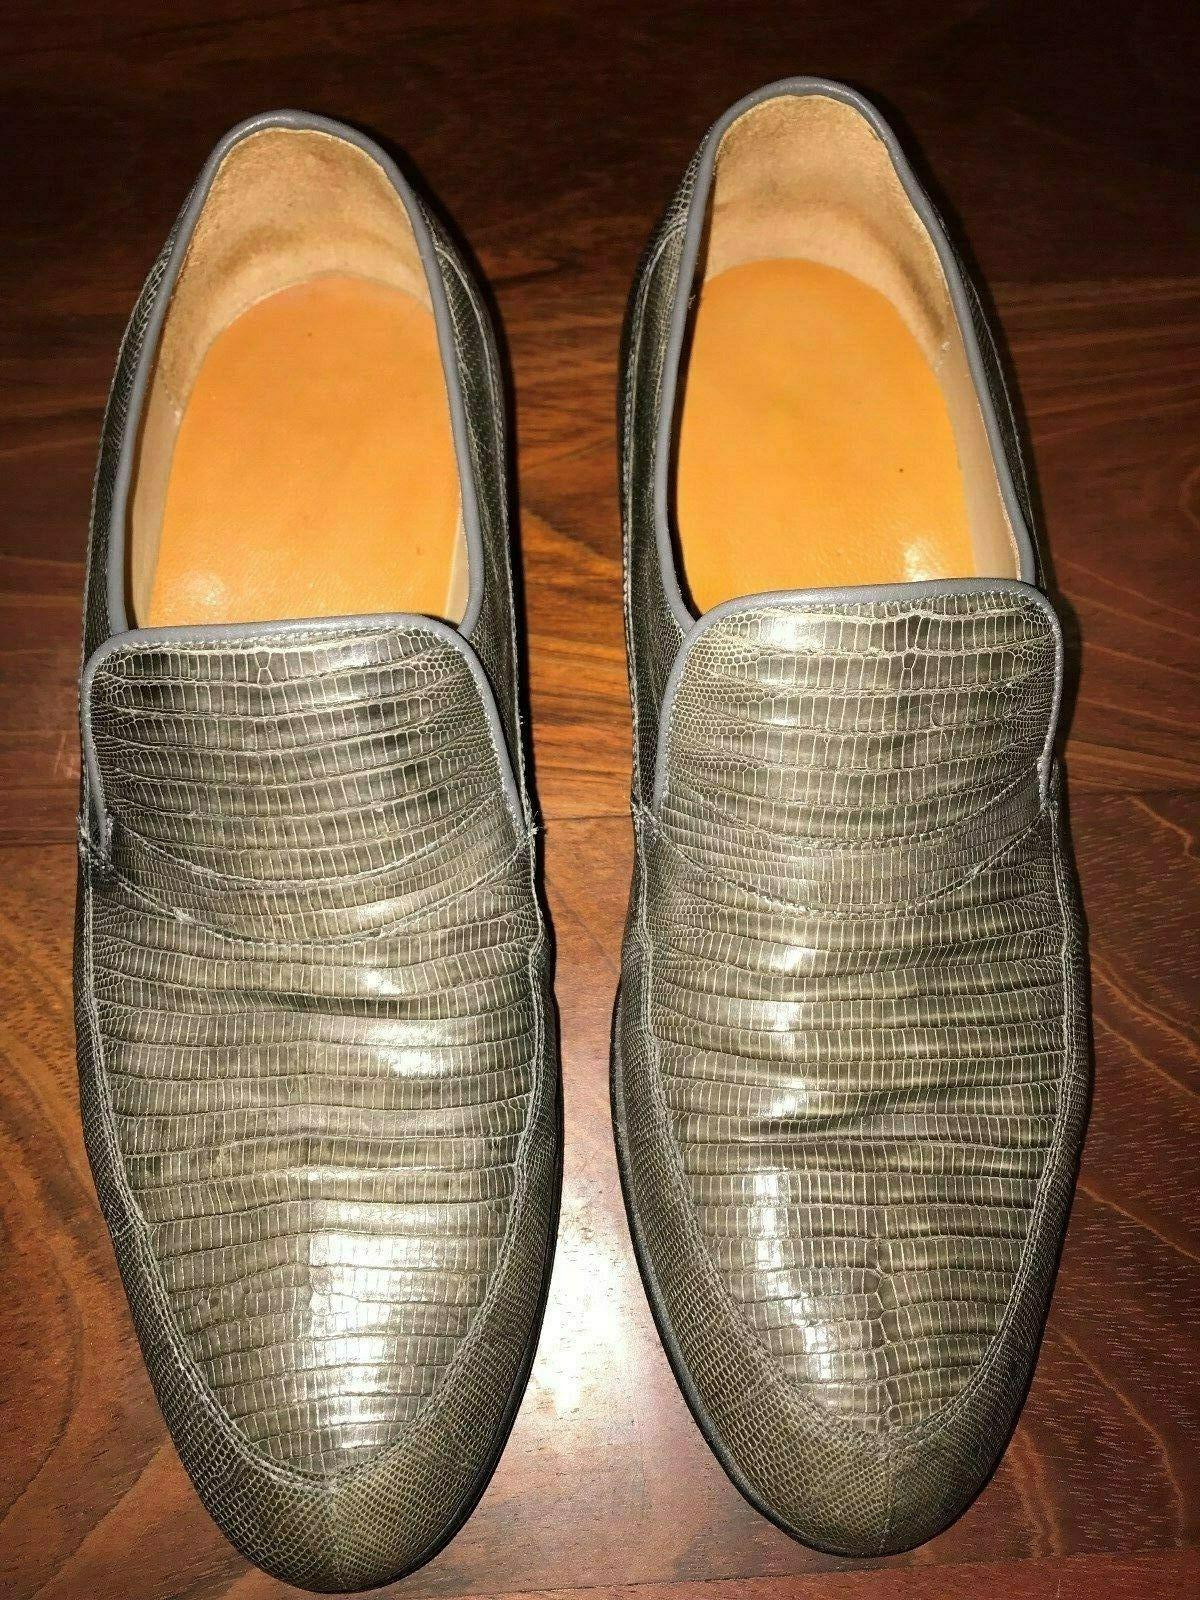 Genuine Lizard Skin Loafers, Grey, Men's size 6 ½ (US).